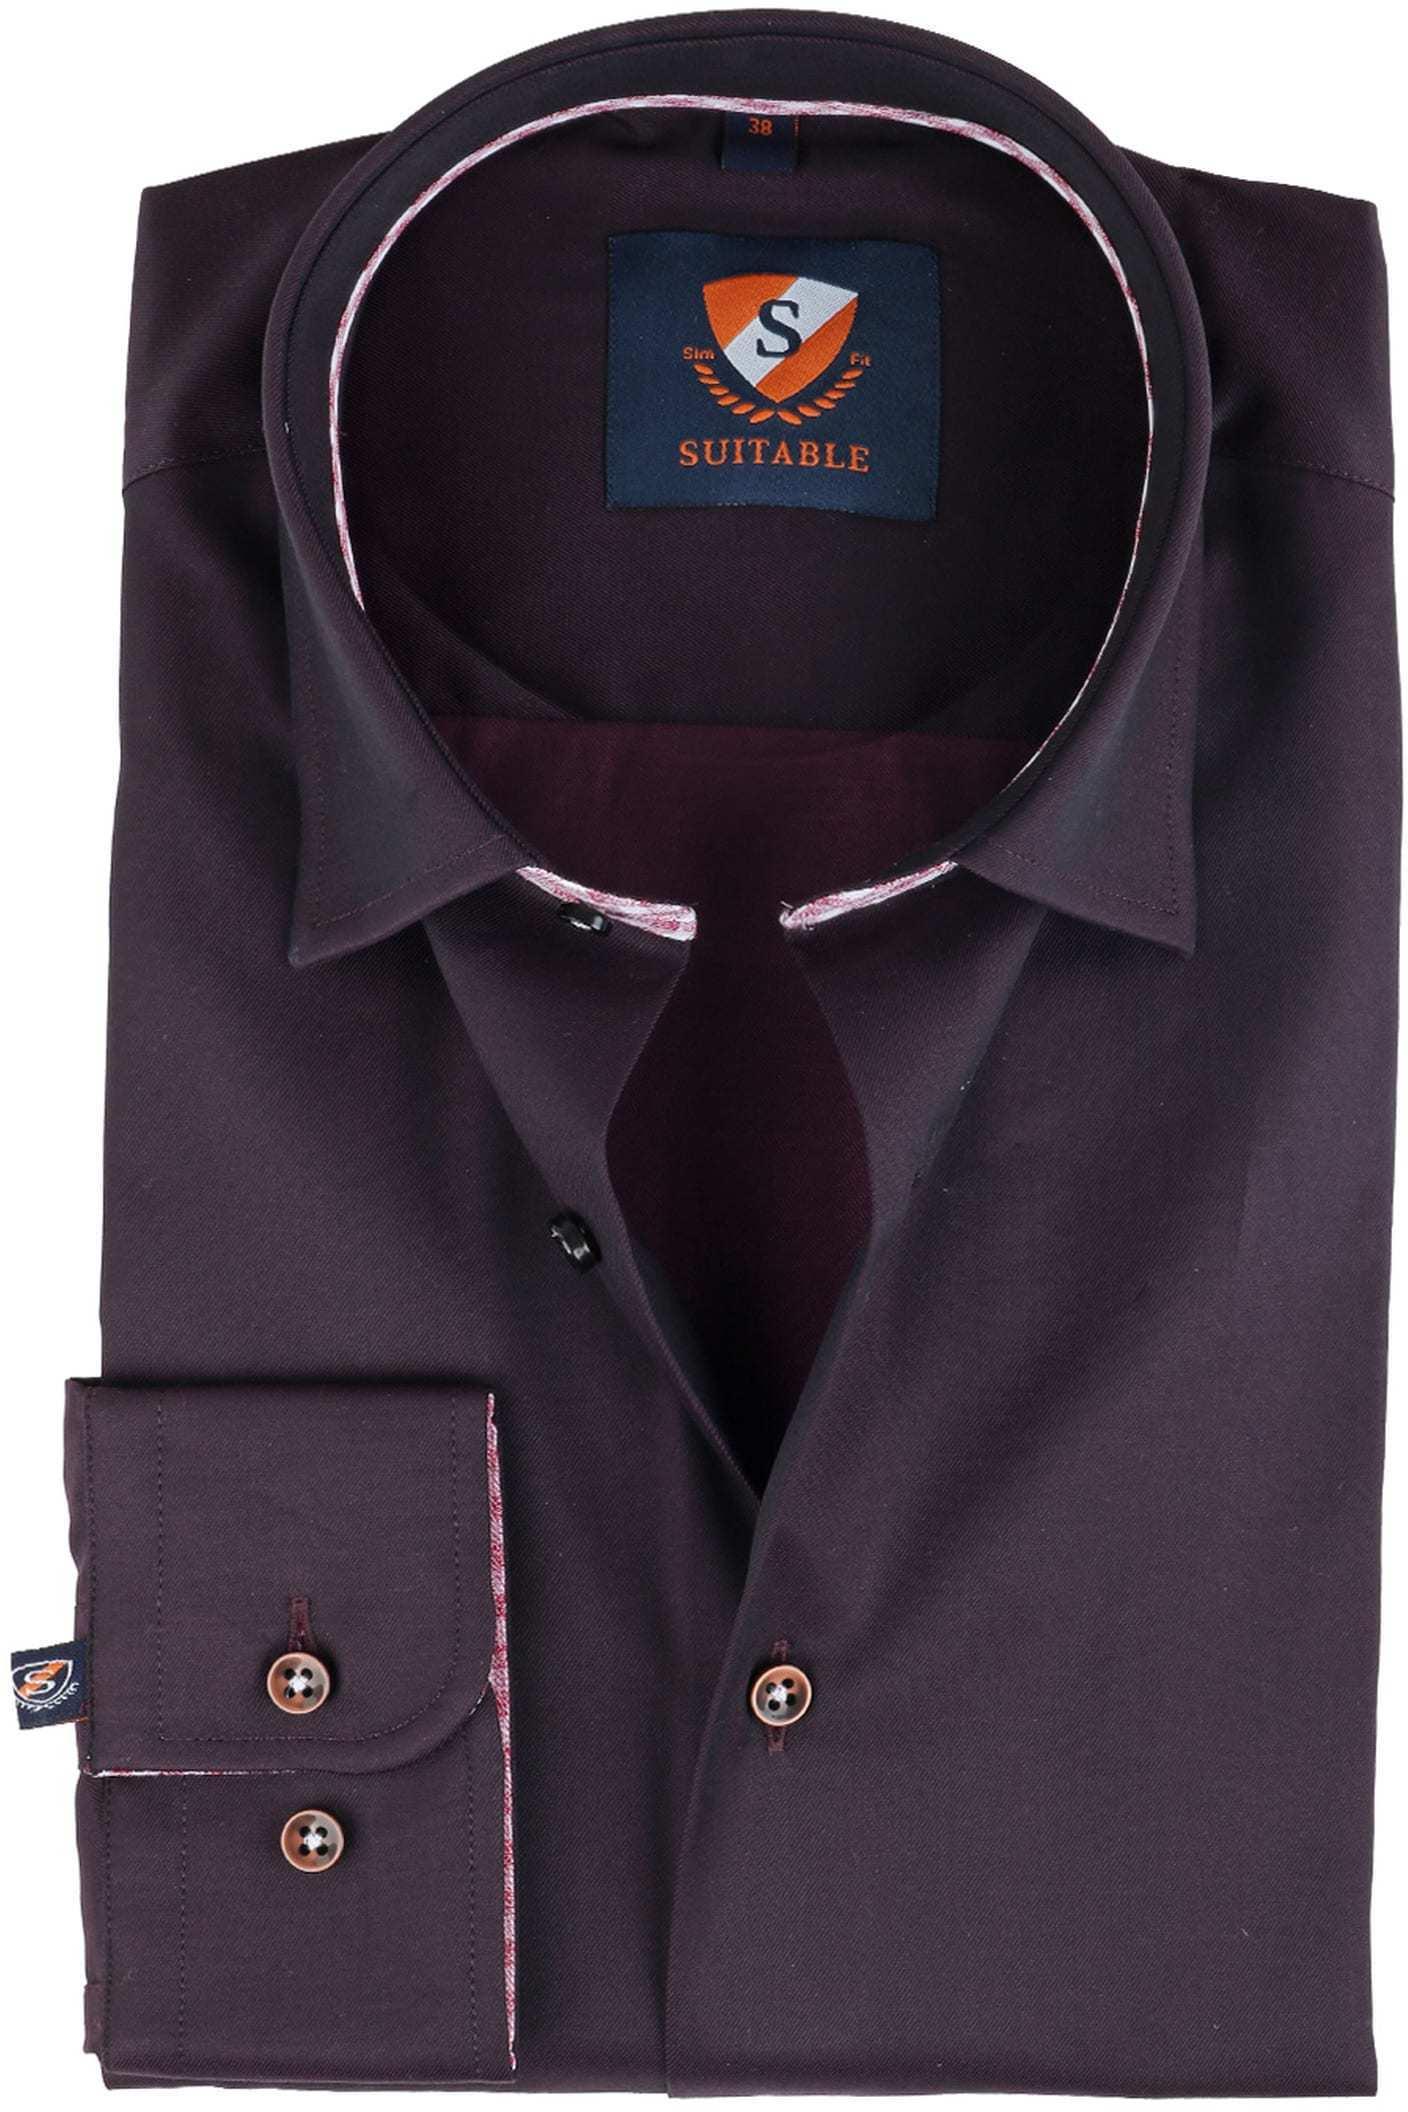 Suitable Overhemd Bruin foto 0